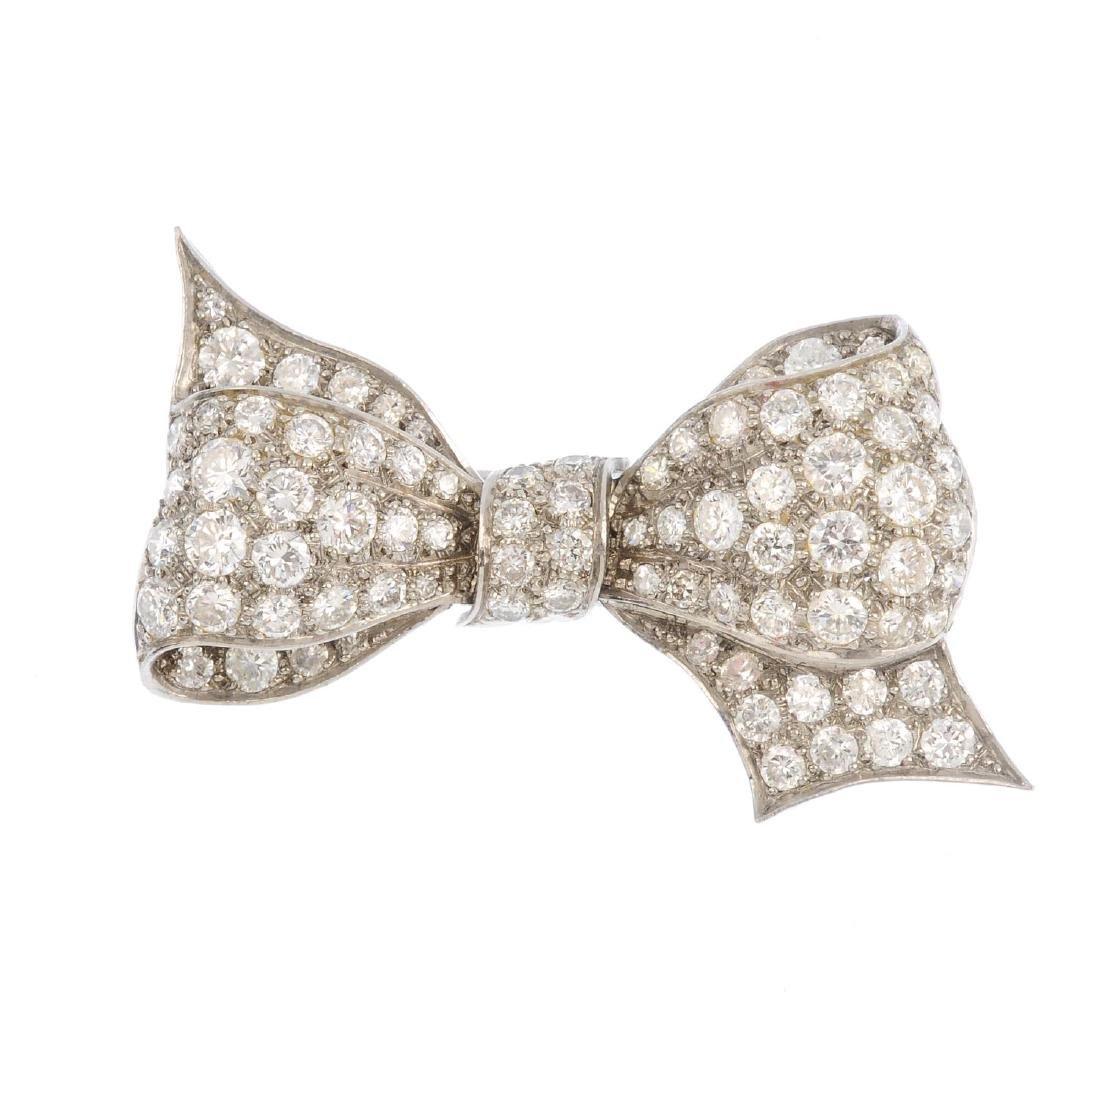 A mid 20th century diamond brooch. Designed as a